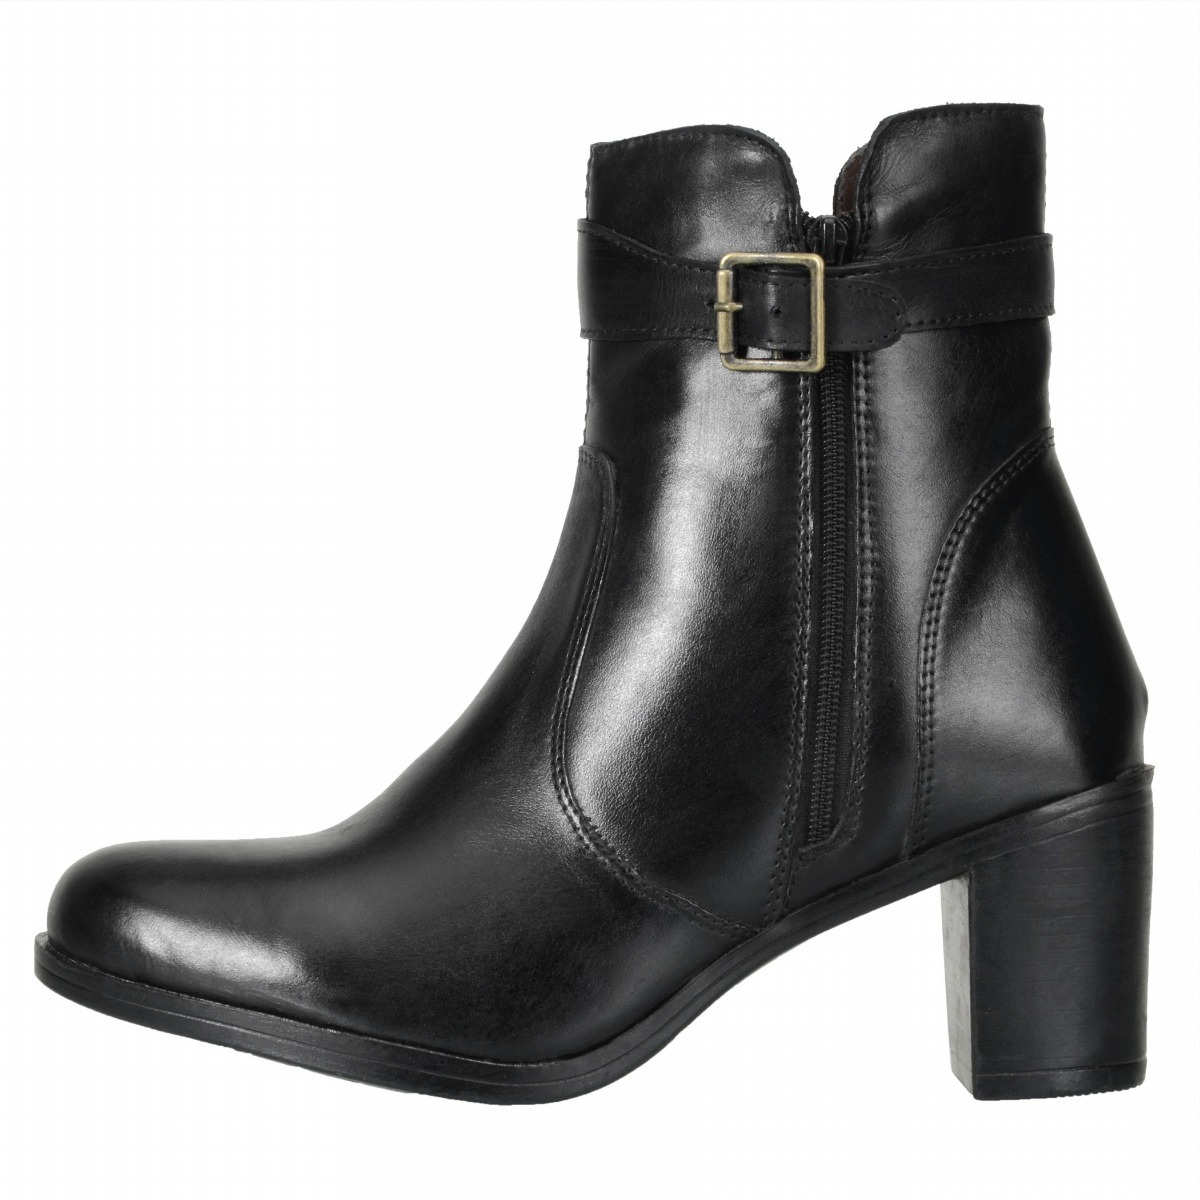 1d258ac736 bota montaria feminina cano baixo 100% couro marca mac shoe. Carregando zoom .